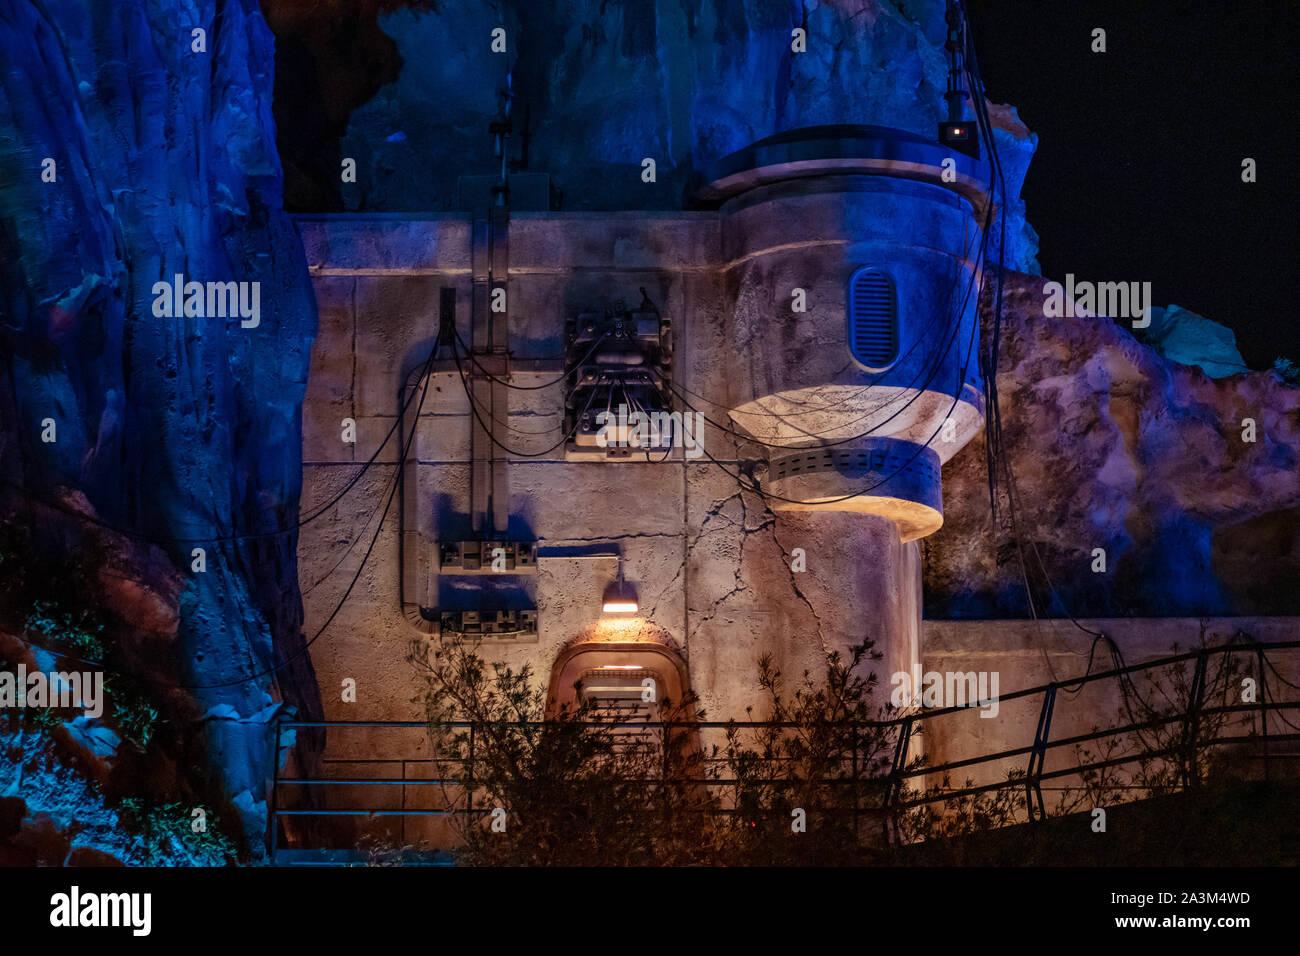 Orlando, Florida. September 27, 2019. Partial view of Star Wars Galaxys Edge at night in Hollywood Studios Stock Photo